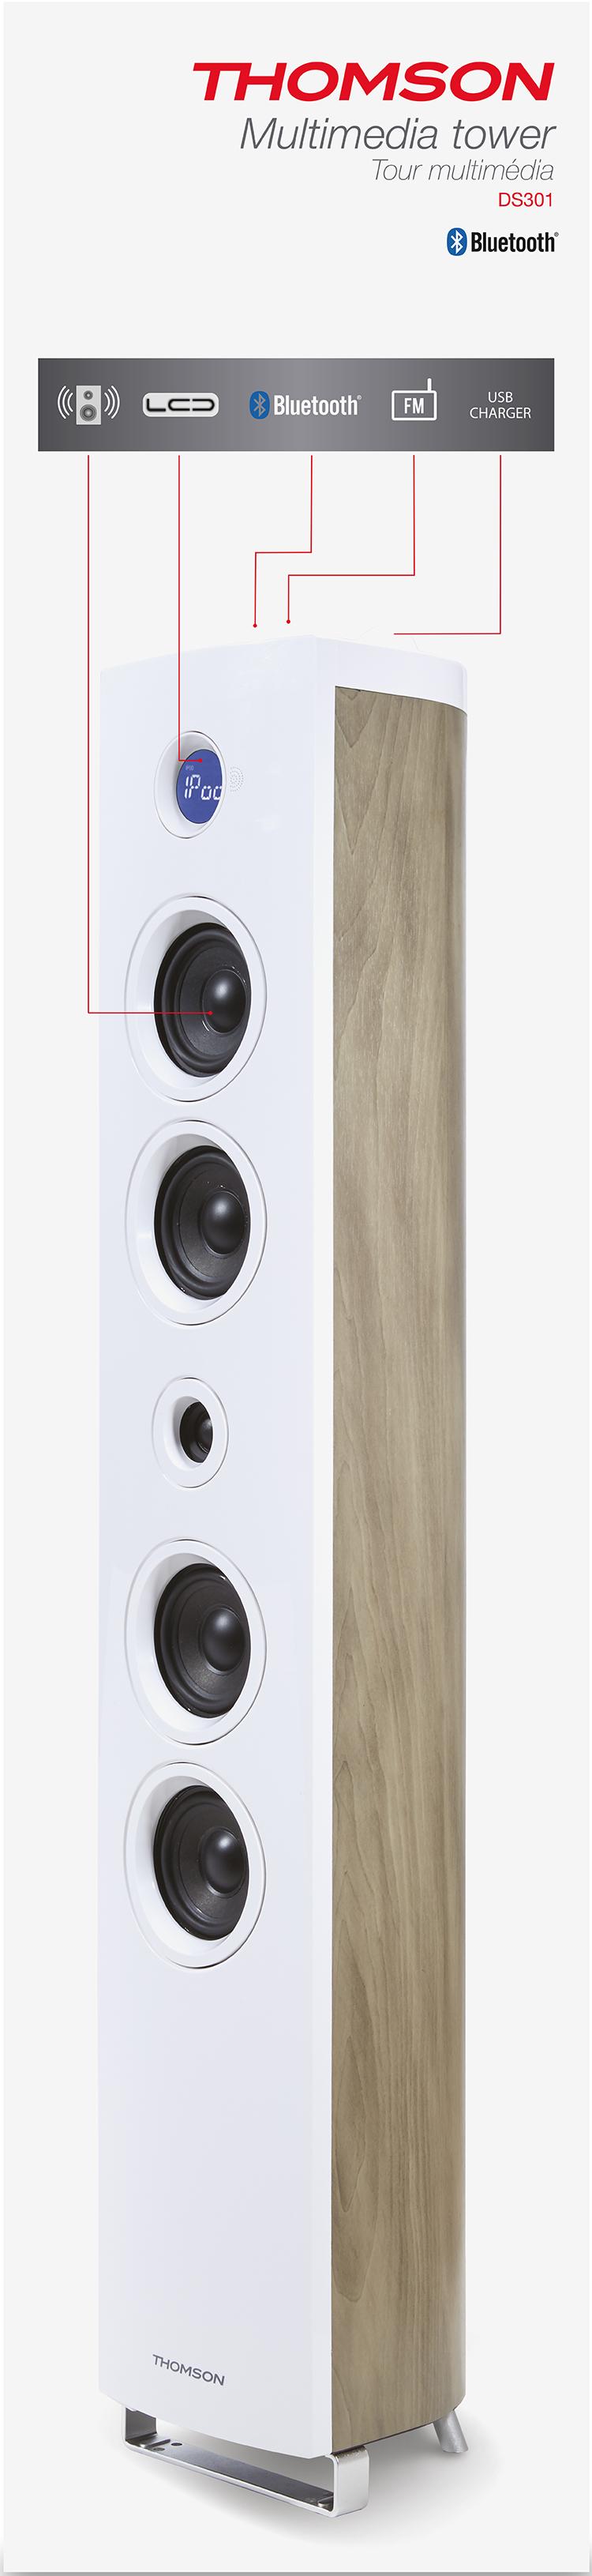 Multimedia Tower 'Wood' (White) - Immagine #2